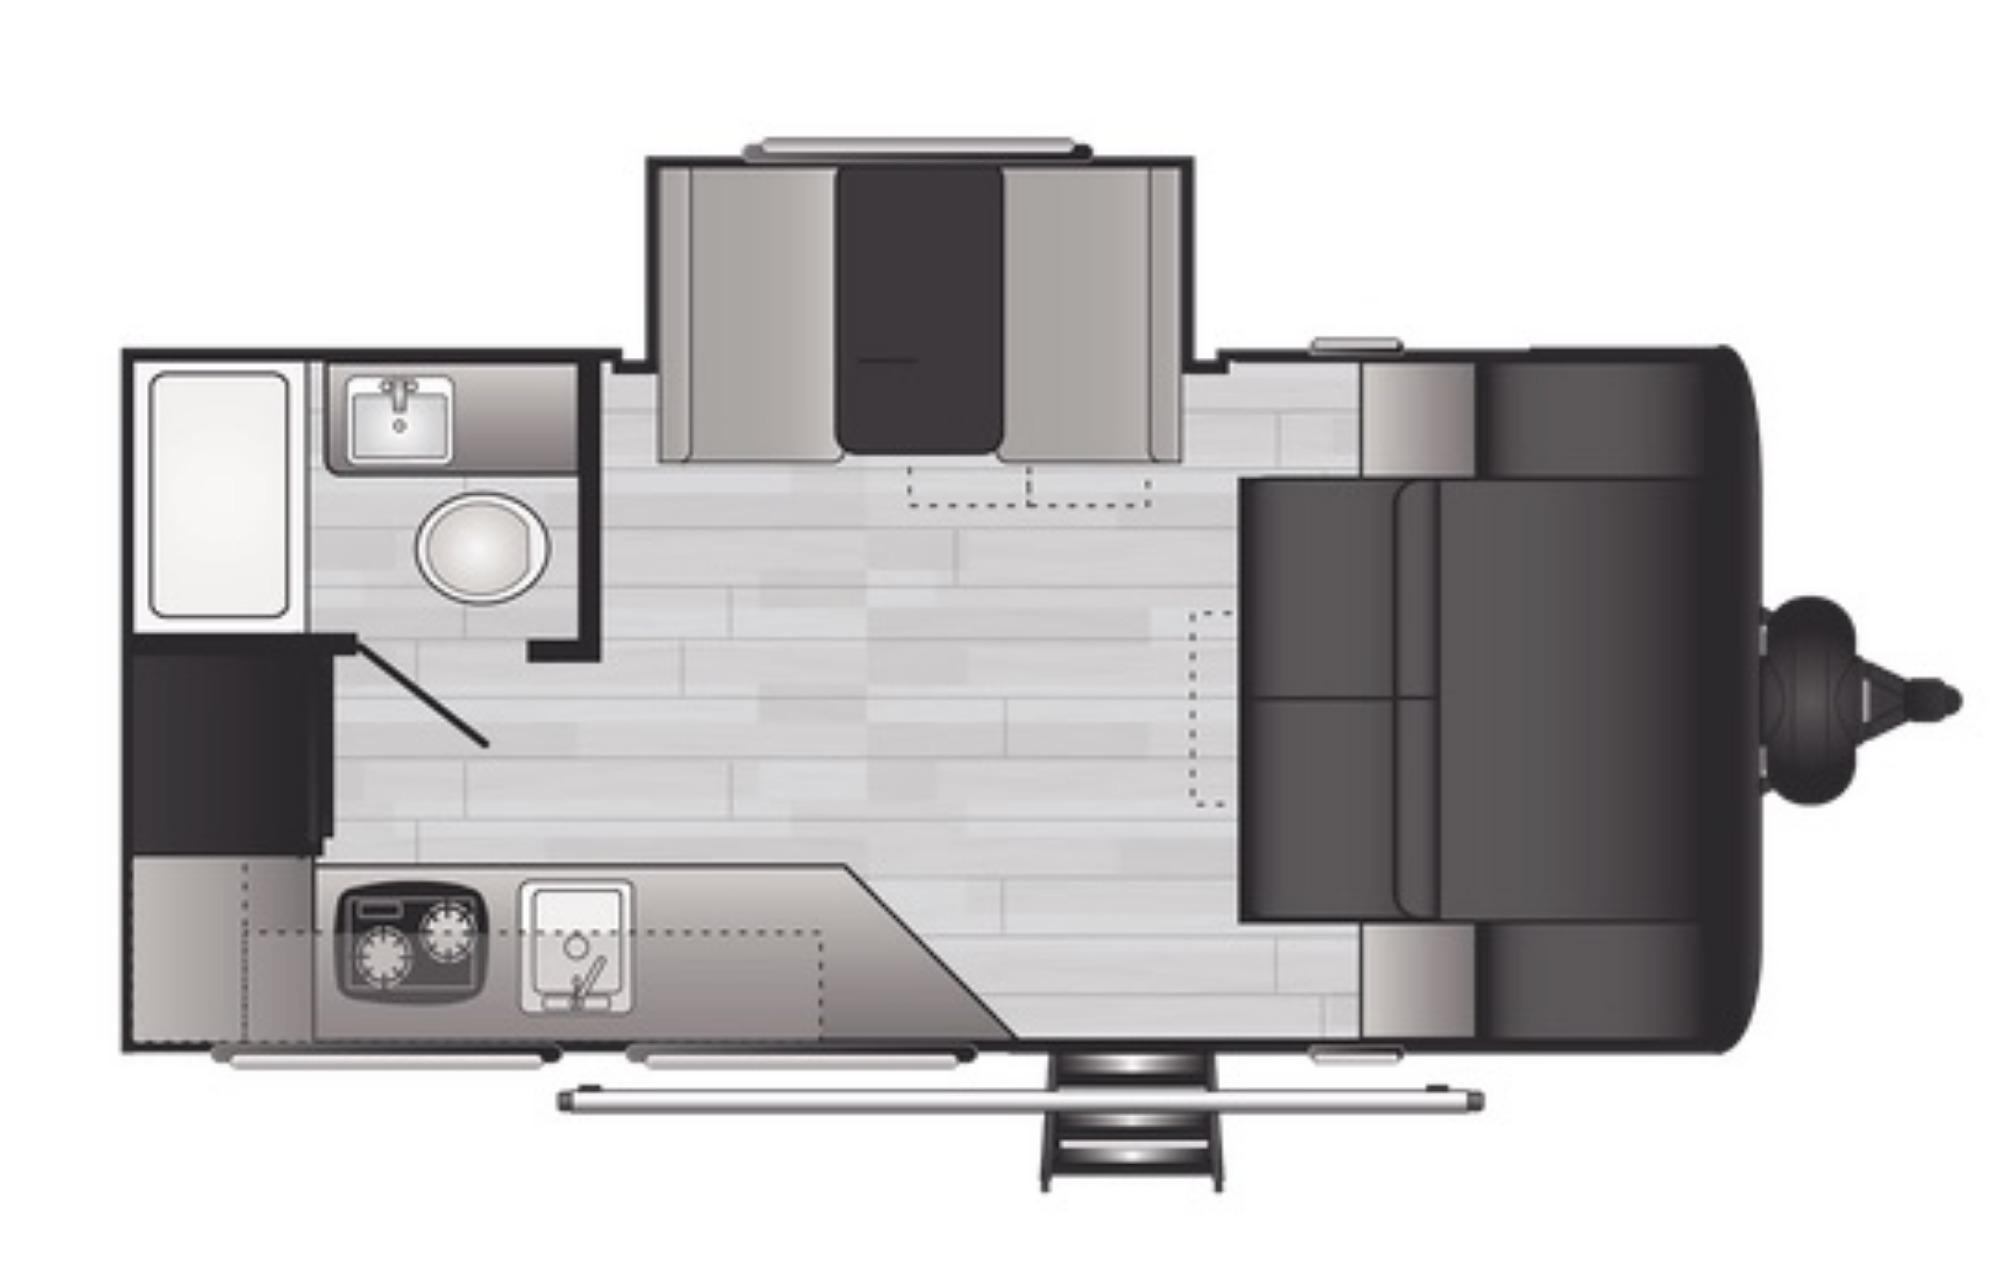 View Floor Plan for 2021 KEYSTONE HIDEOUT 174RK